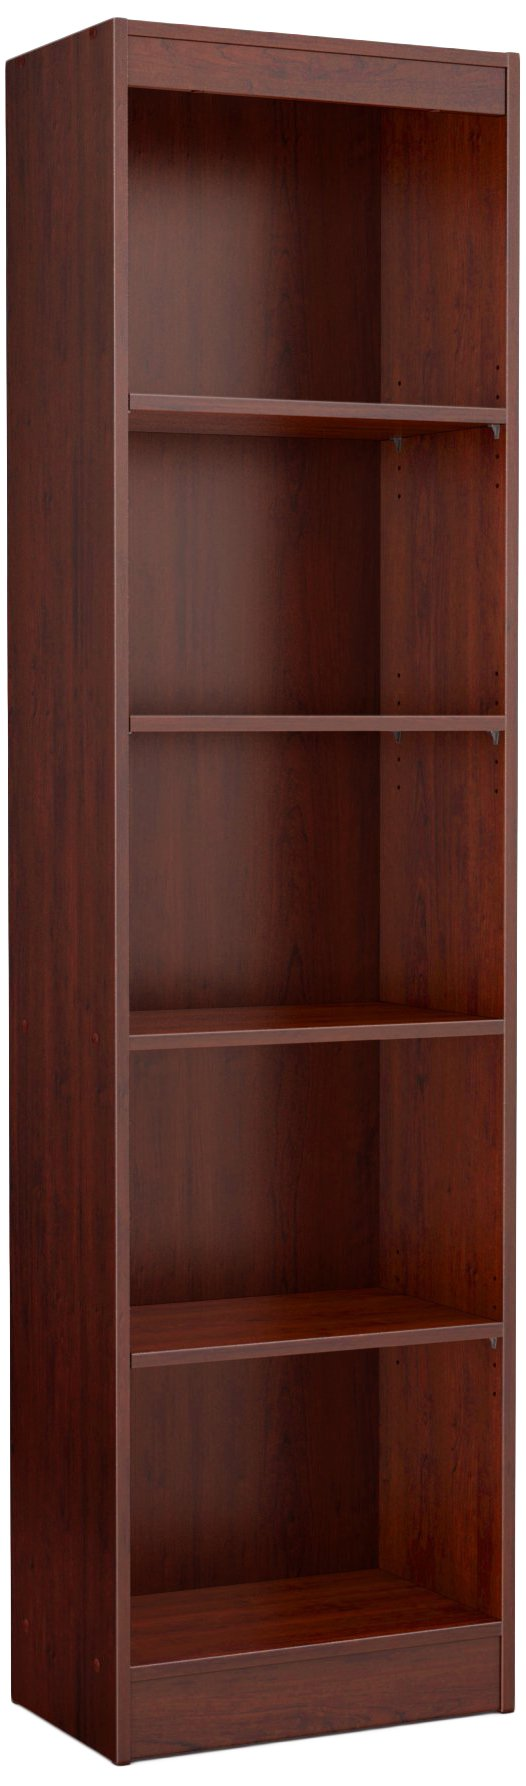 South Shore Narrow 5-Shelf Storage Bookcase, Royal Cherry